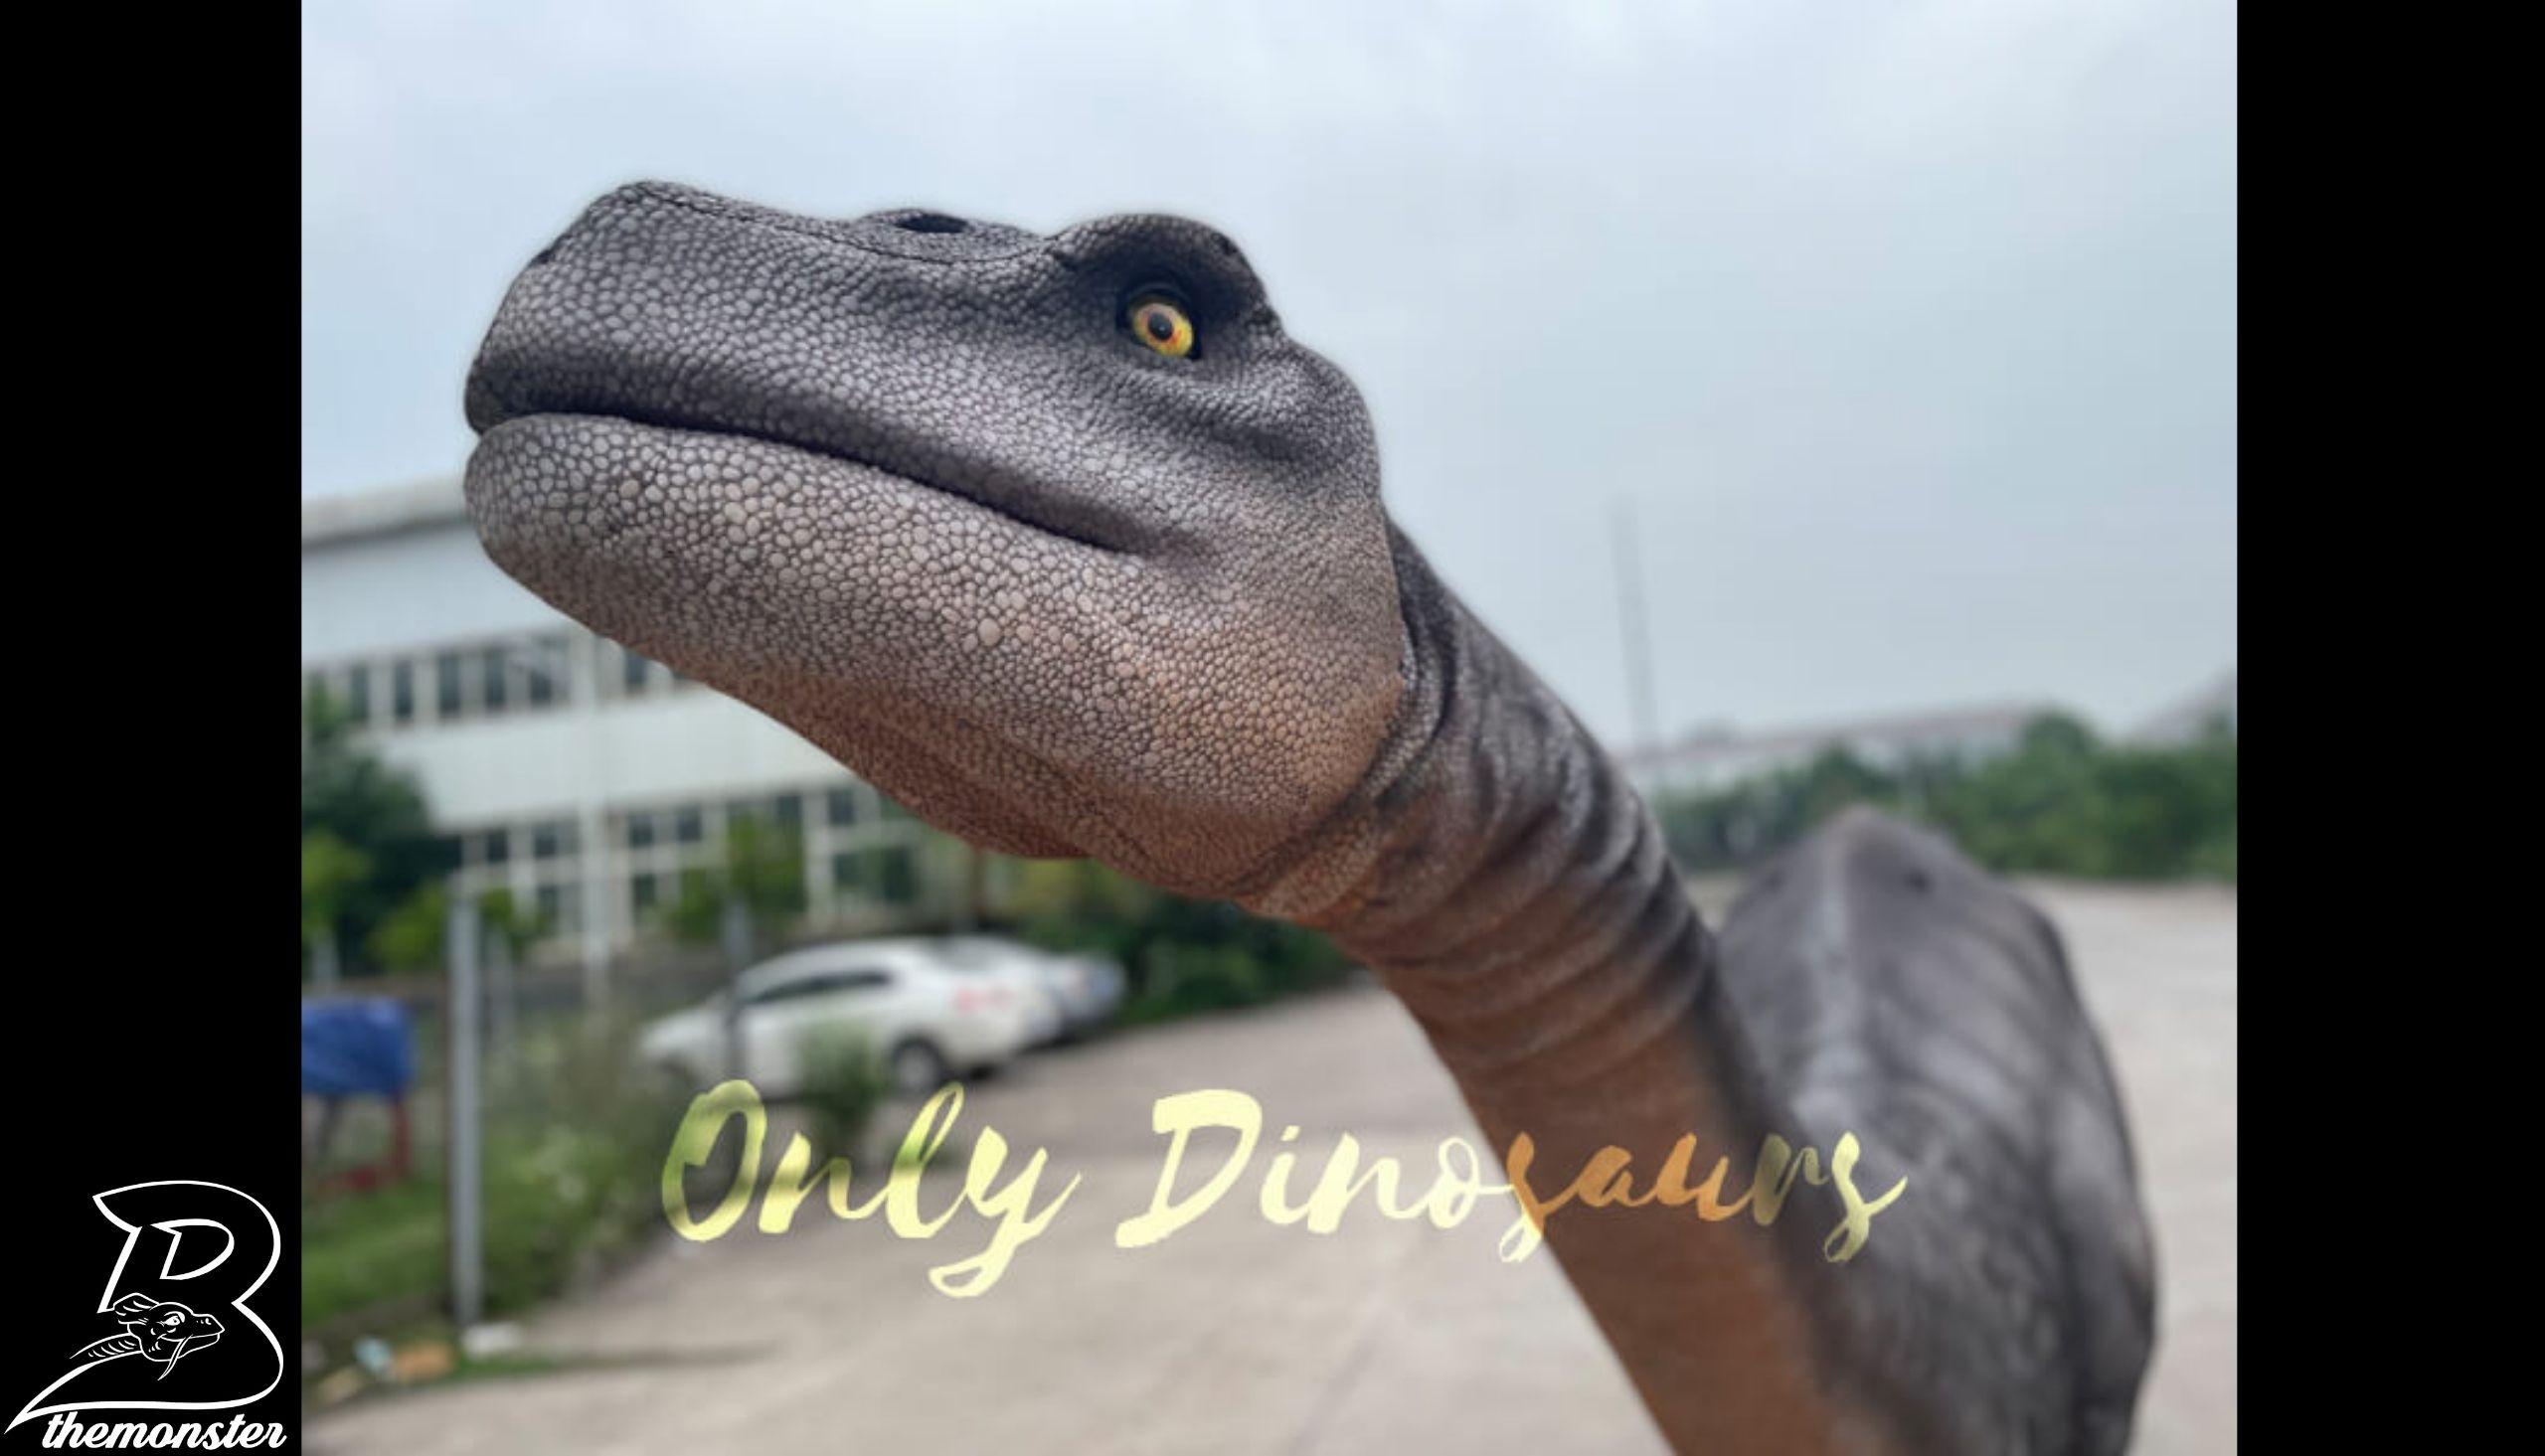 Realistic Two-Person Brontosaurus Dinosaur Costume in vendita sul Bthemonster.com